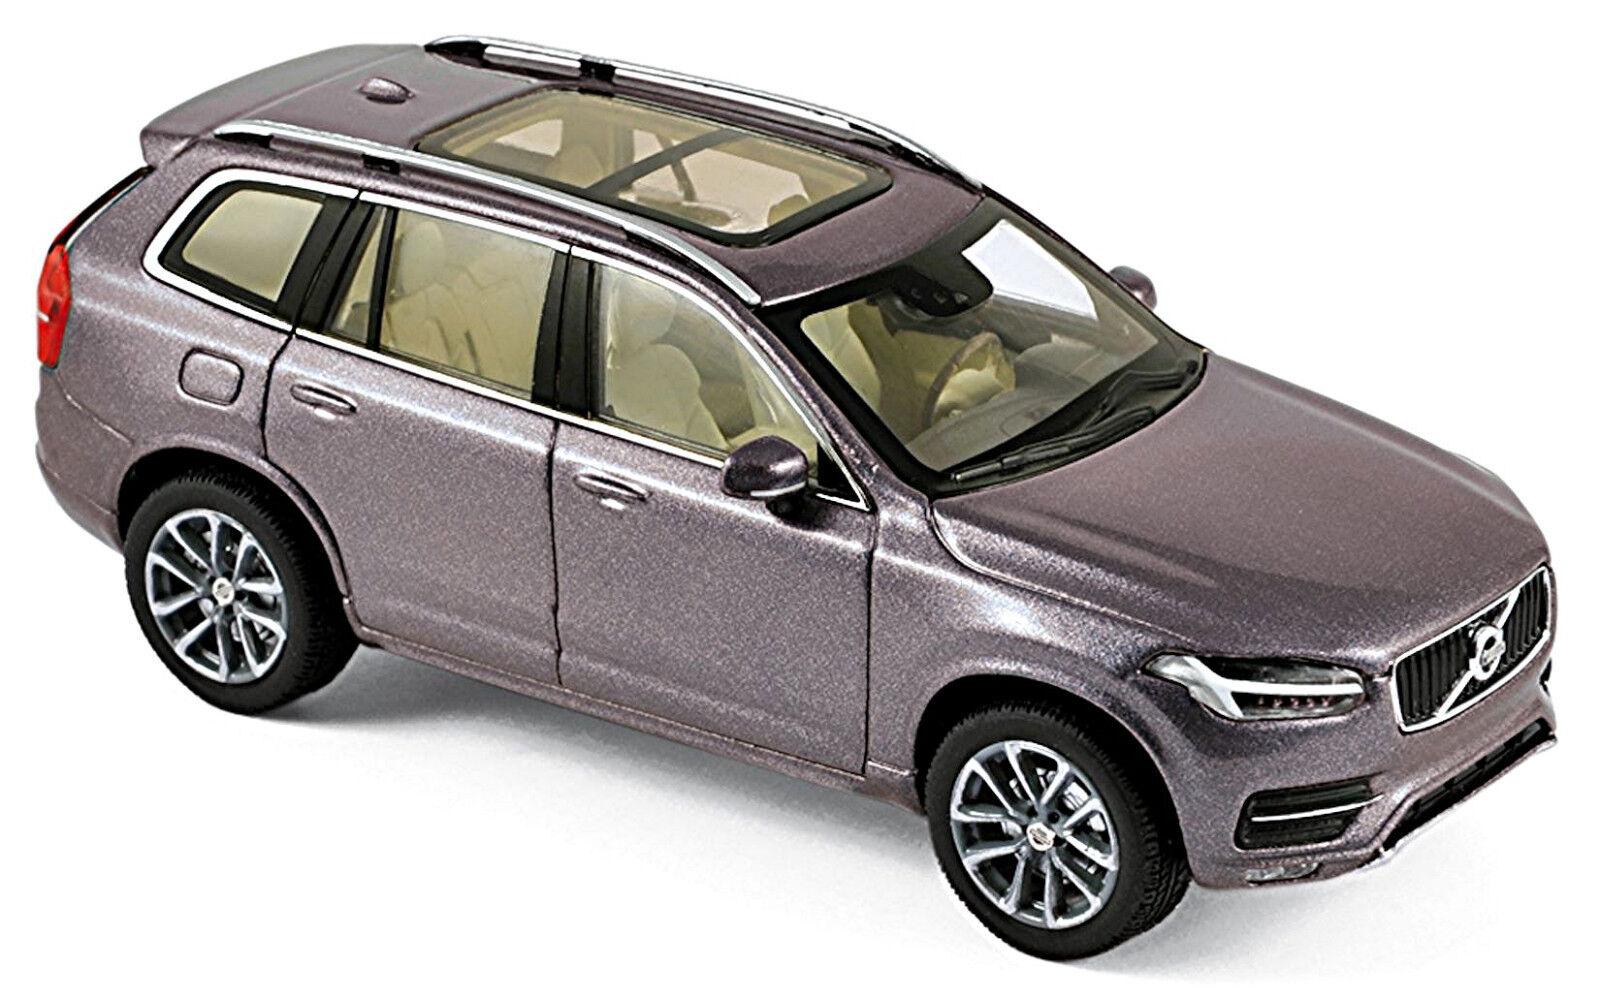 VOLVO XC90 XC90 XC90 SUV 2015-18 gris Savile gris metálico 1 43 Norev 77b678